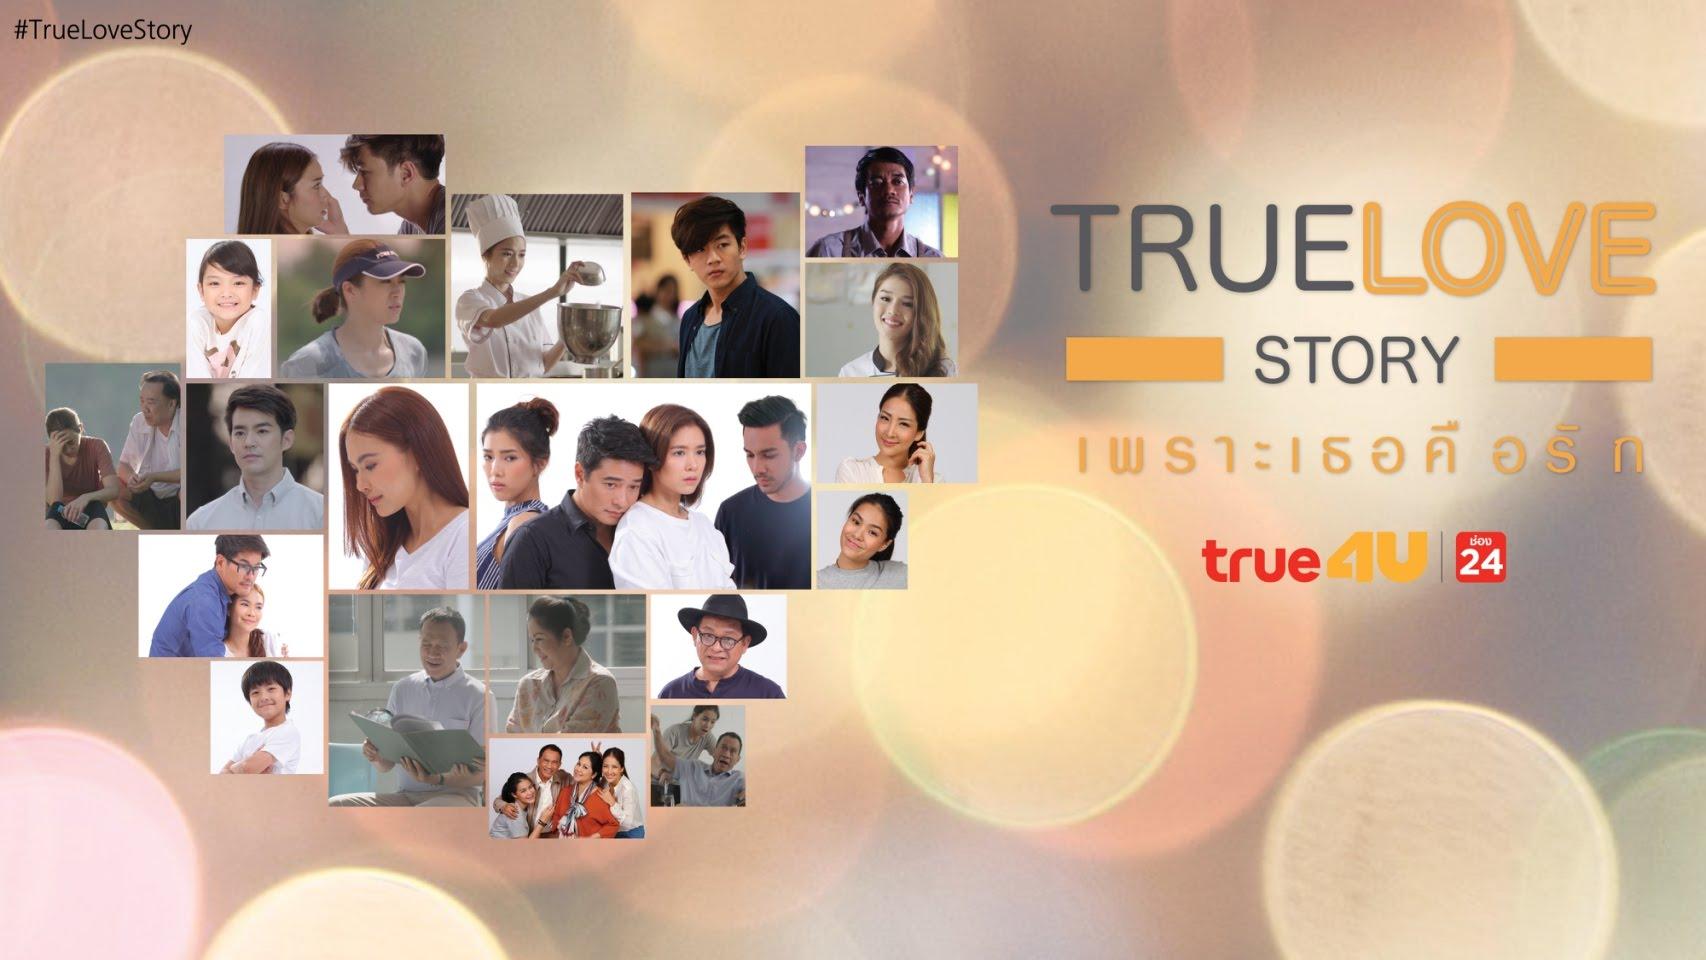 True love story เพราะเธอคือรัก TRUE LOVE STORY เพราะเธอคือรัก : รักคุณเข้าอีกแล้ว ตอนที่ 1